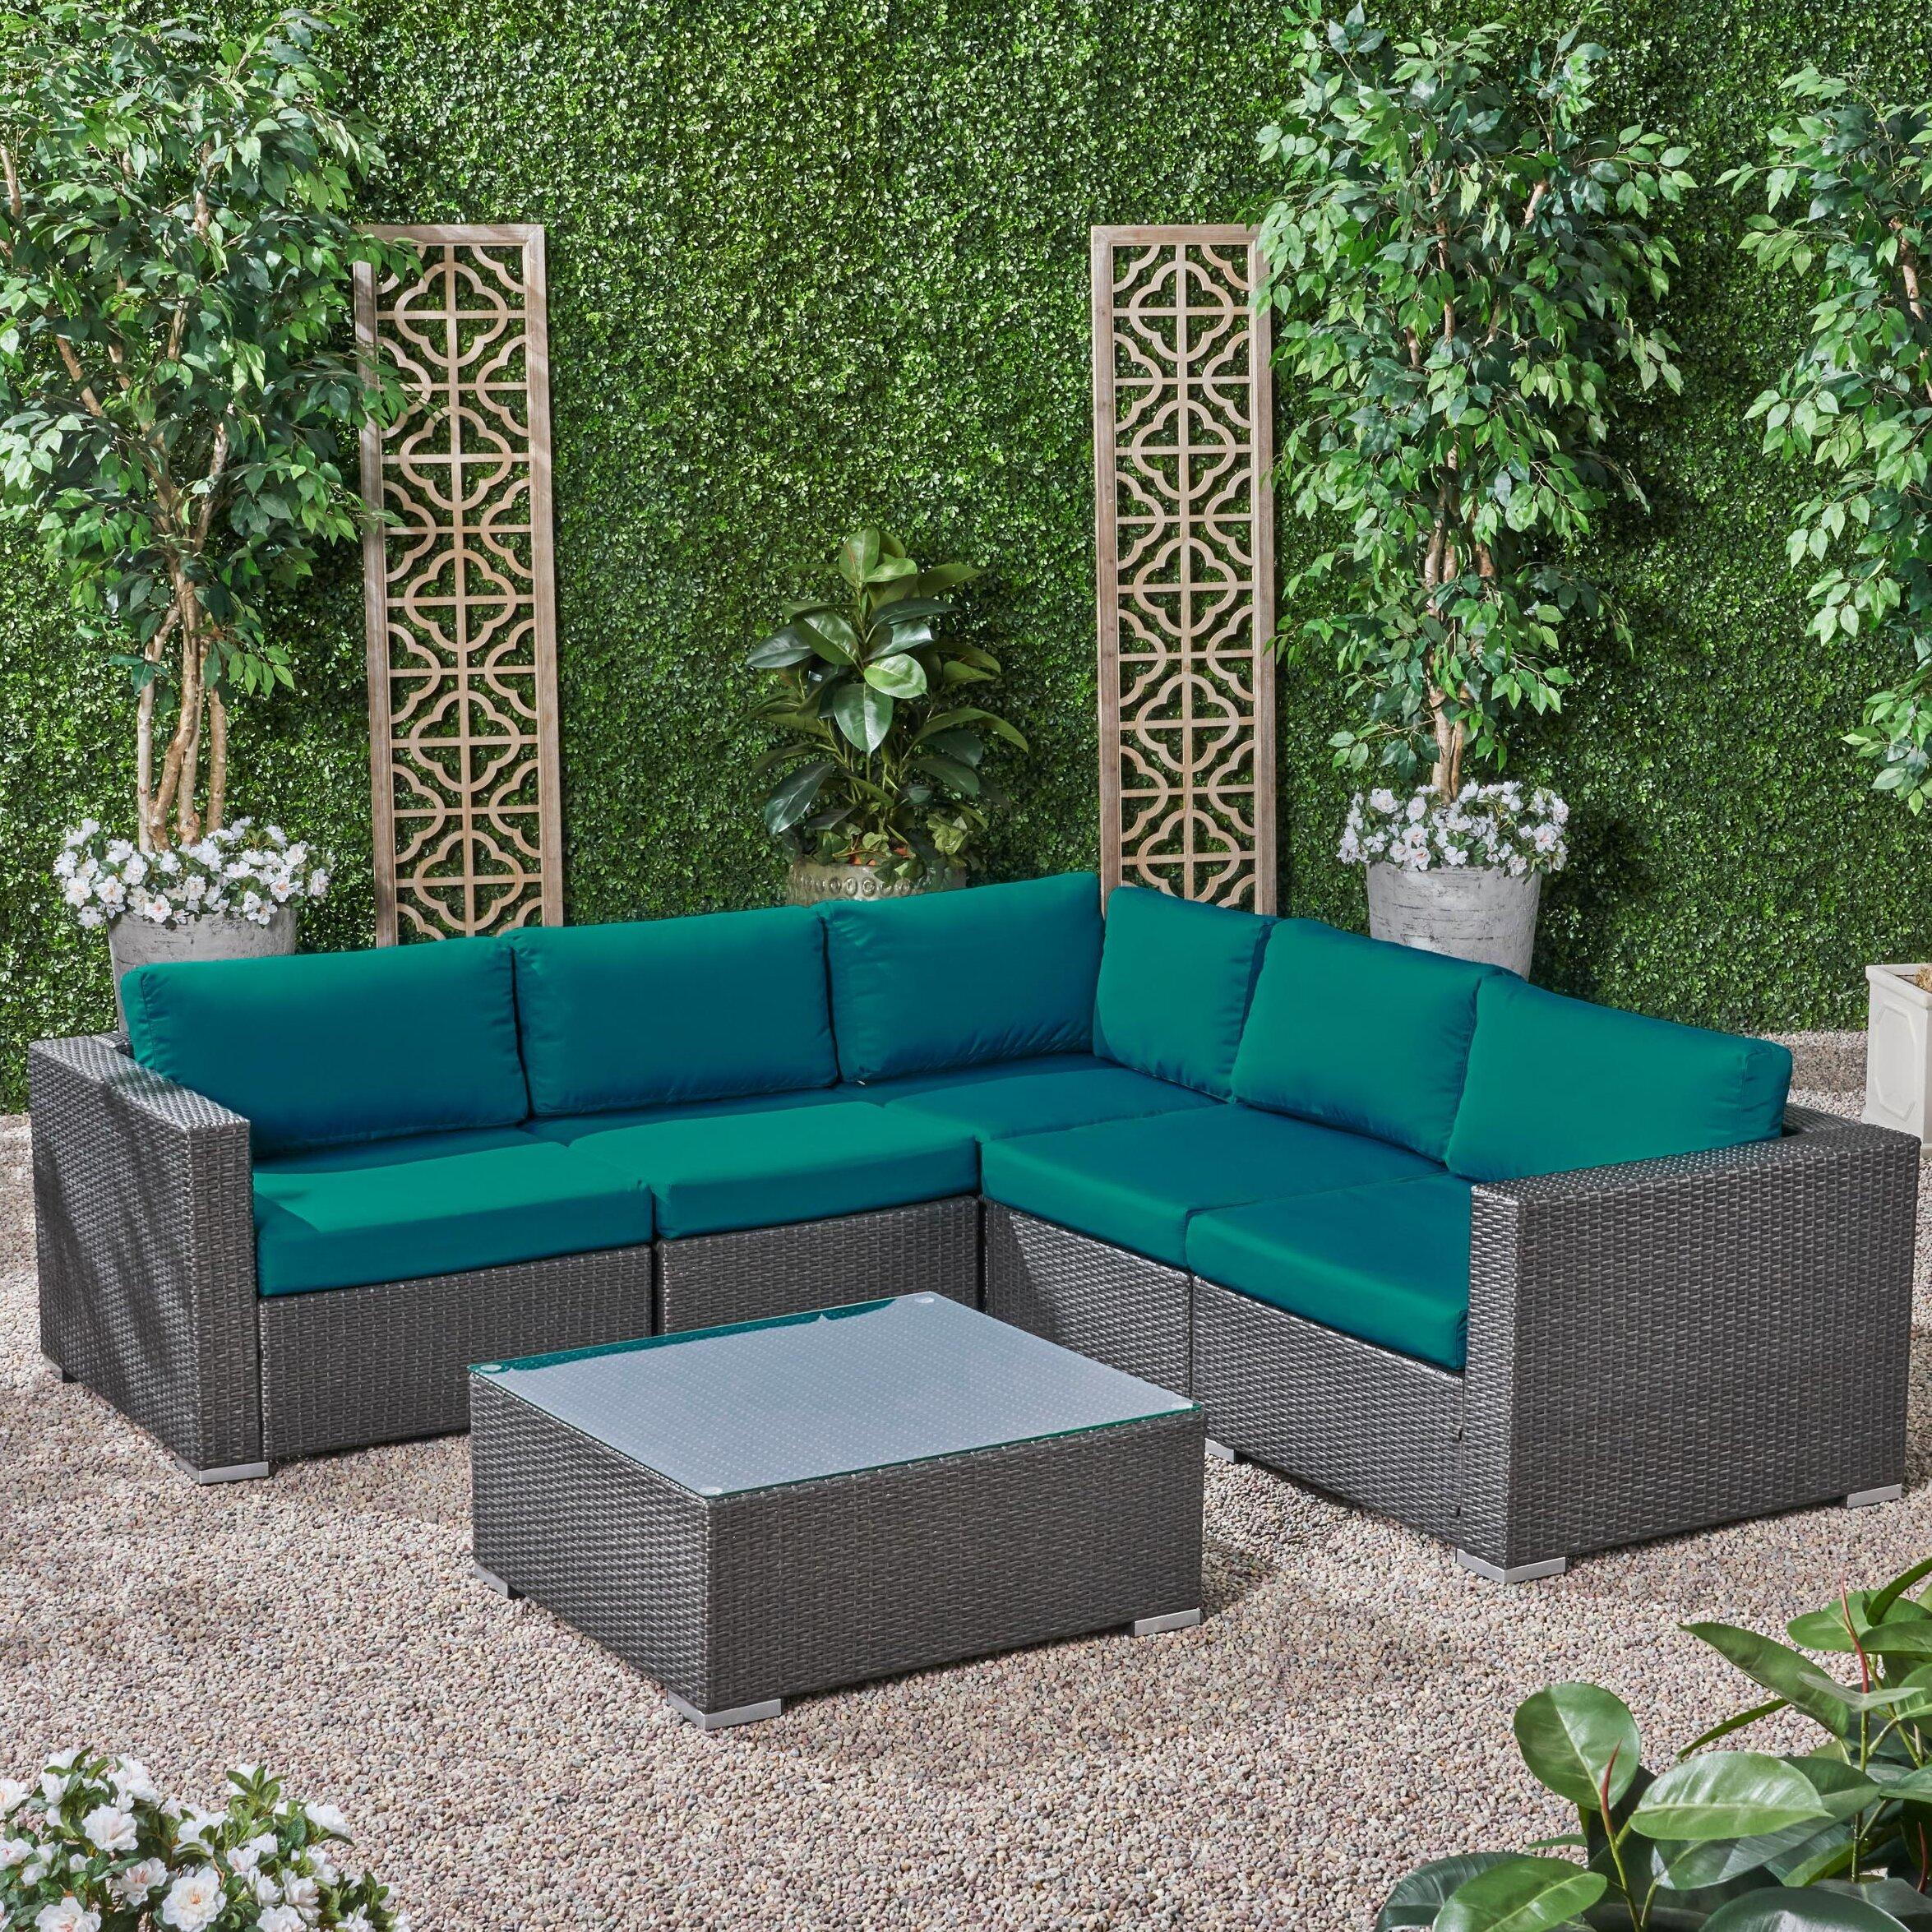 Roxann Outdoor 5 Seater Wicker Sectional Sofa Set with Sunbrella Cushions